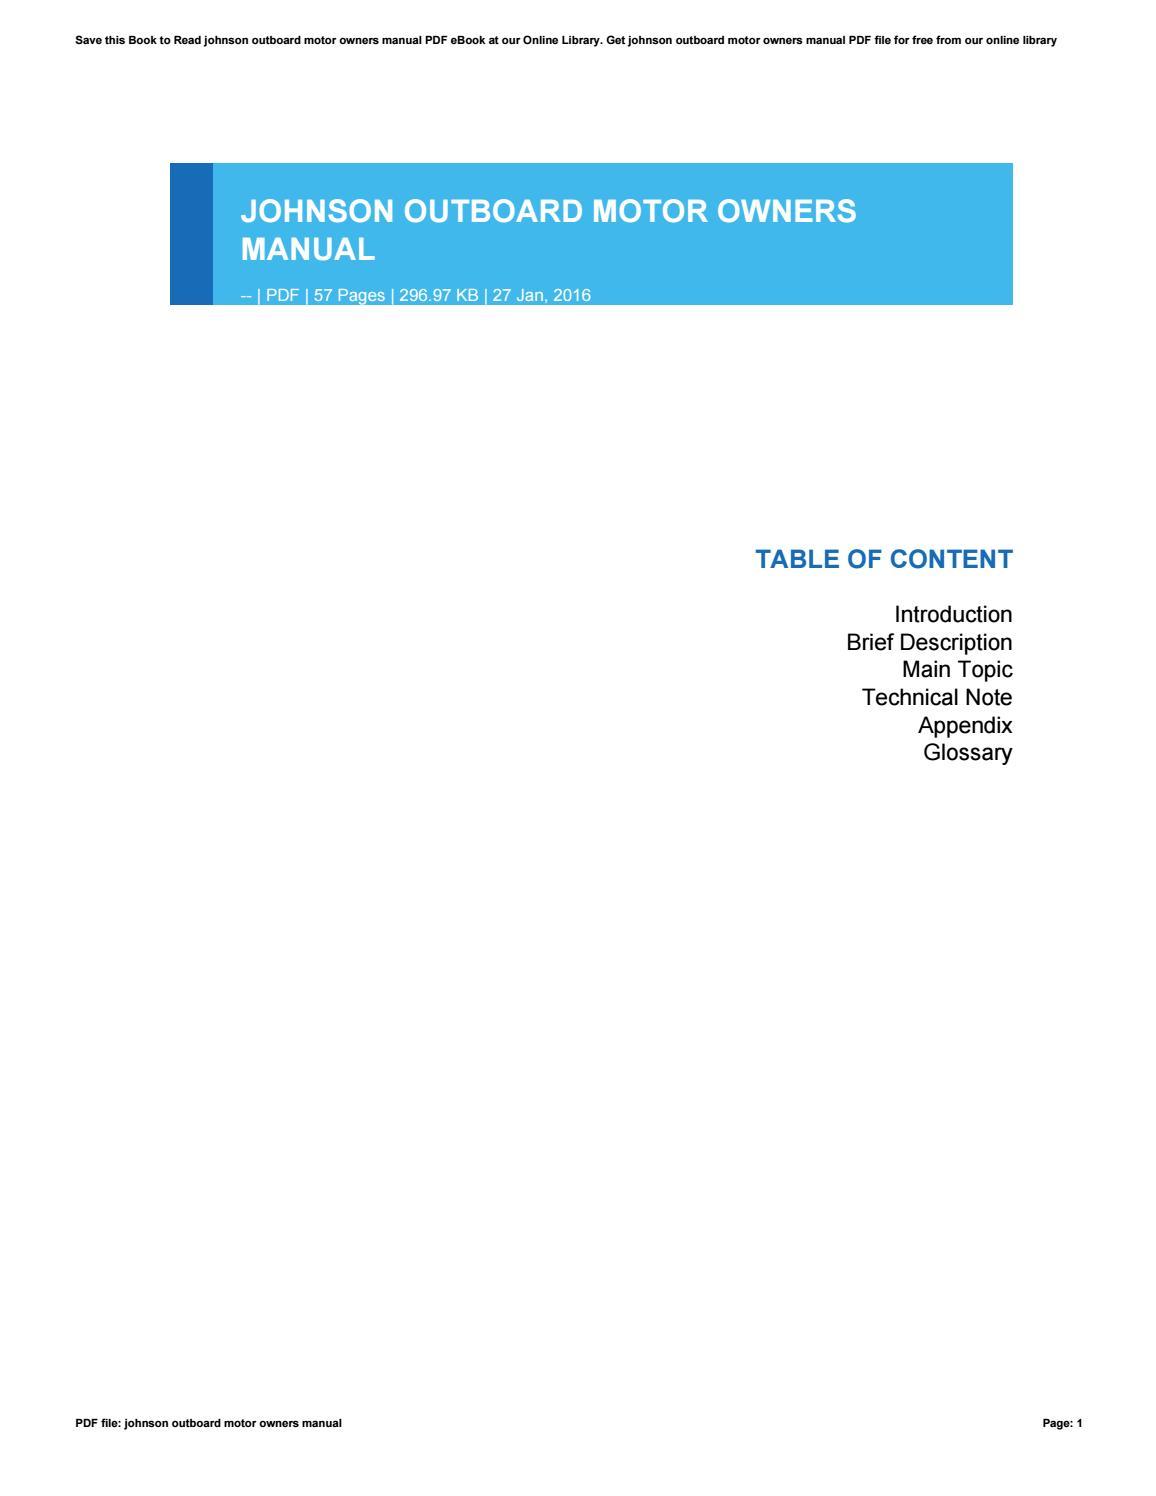 johnson outboard motor owners manual by szerz61 issuu rh issuu com Johnson  Tilt Trim Motor Johnson Outboard Troubleshooting